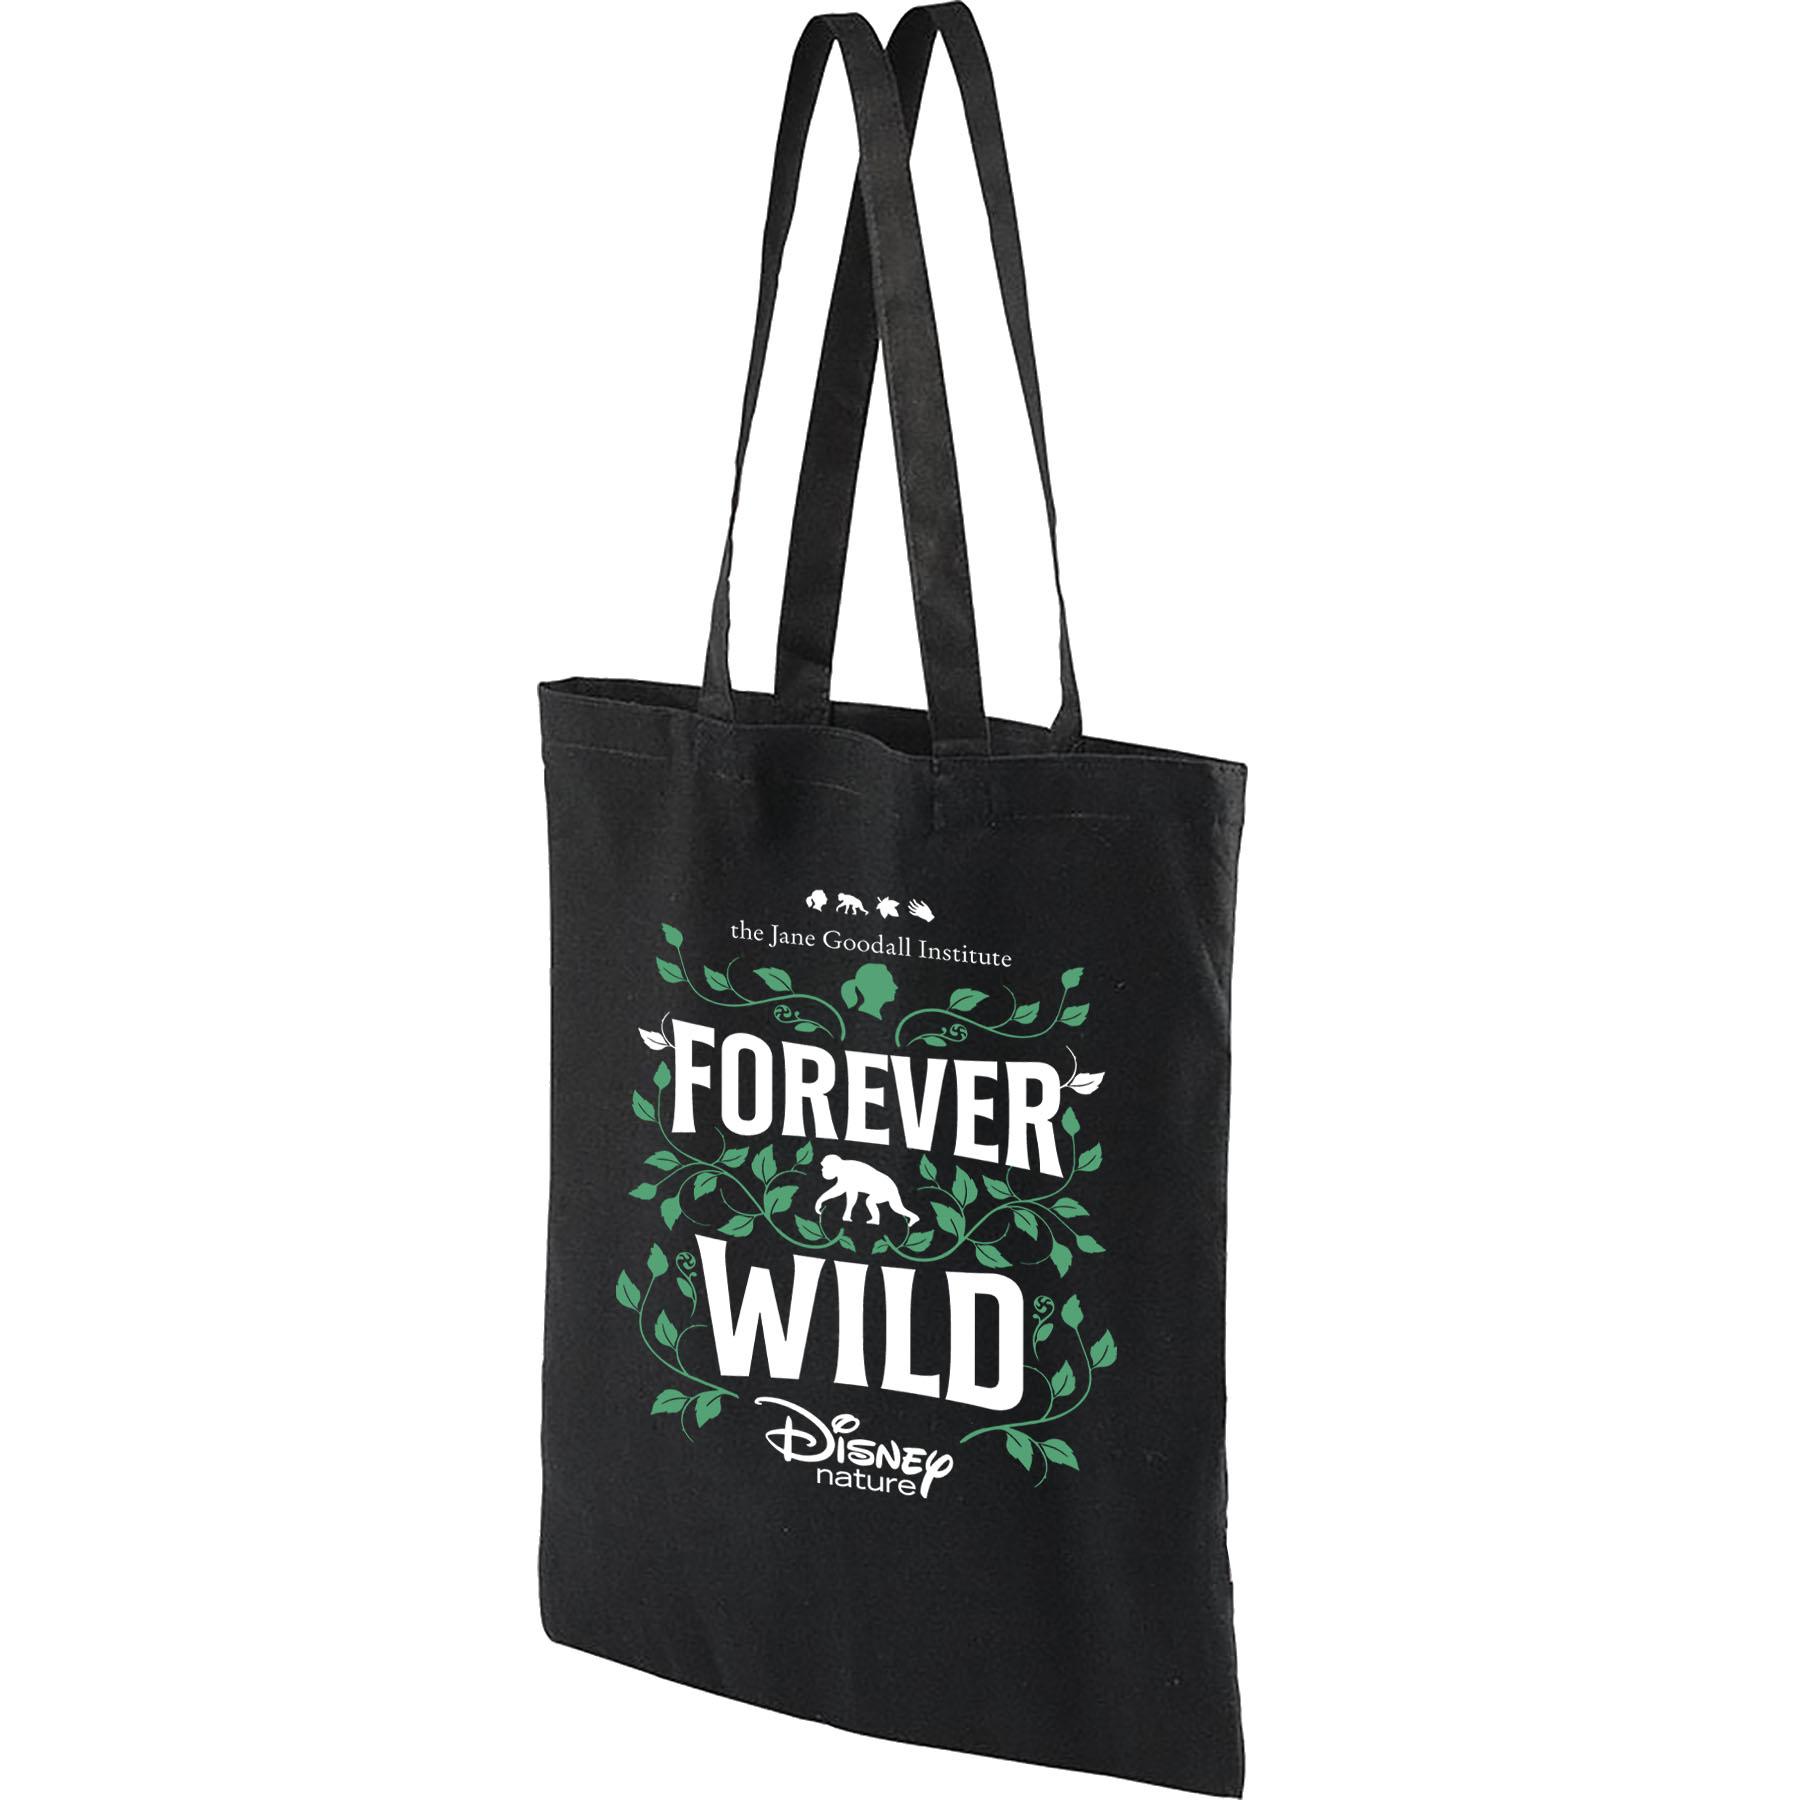 Disneynature + JGI Forever Wild - Black Tote